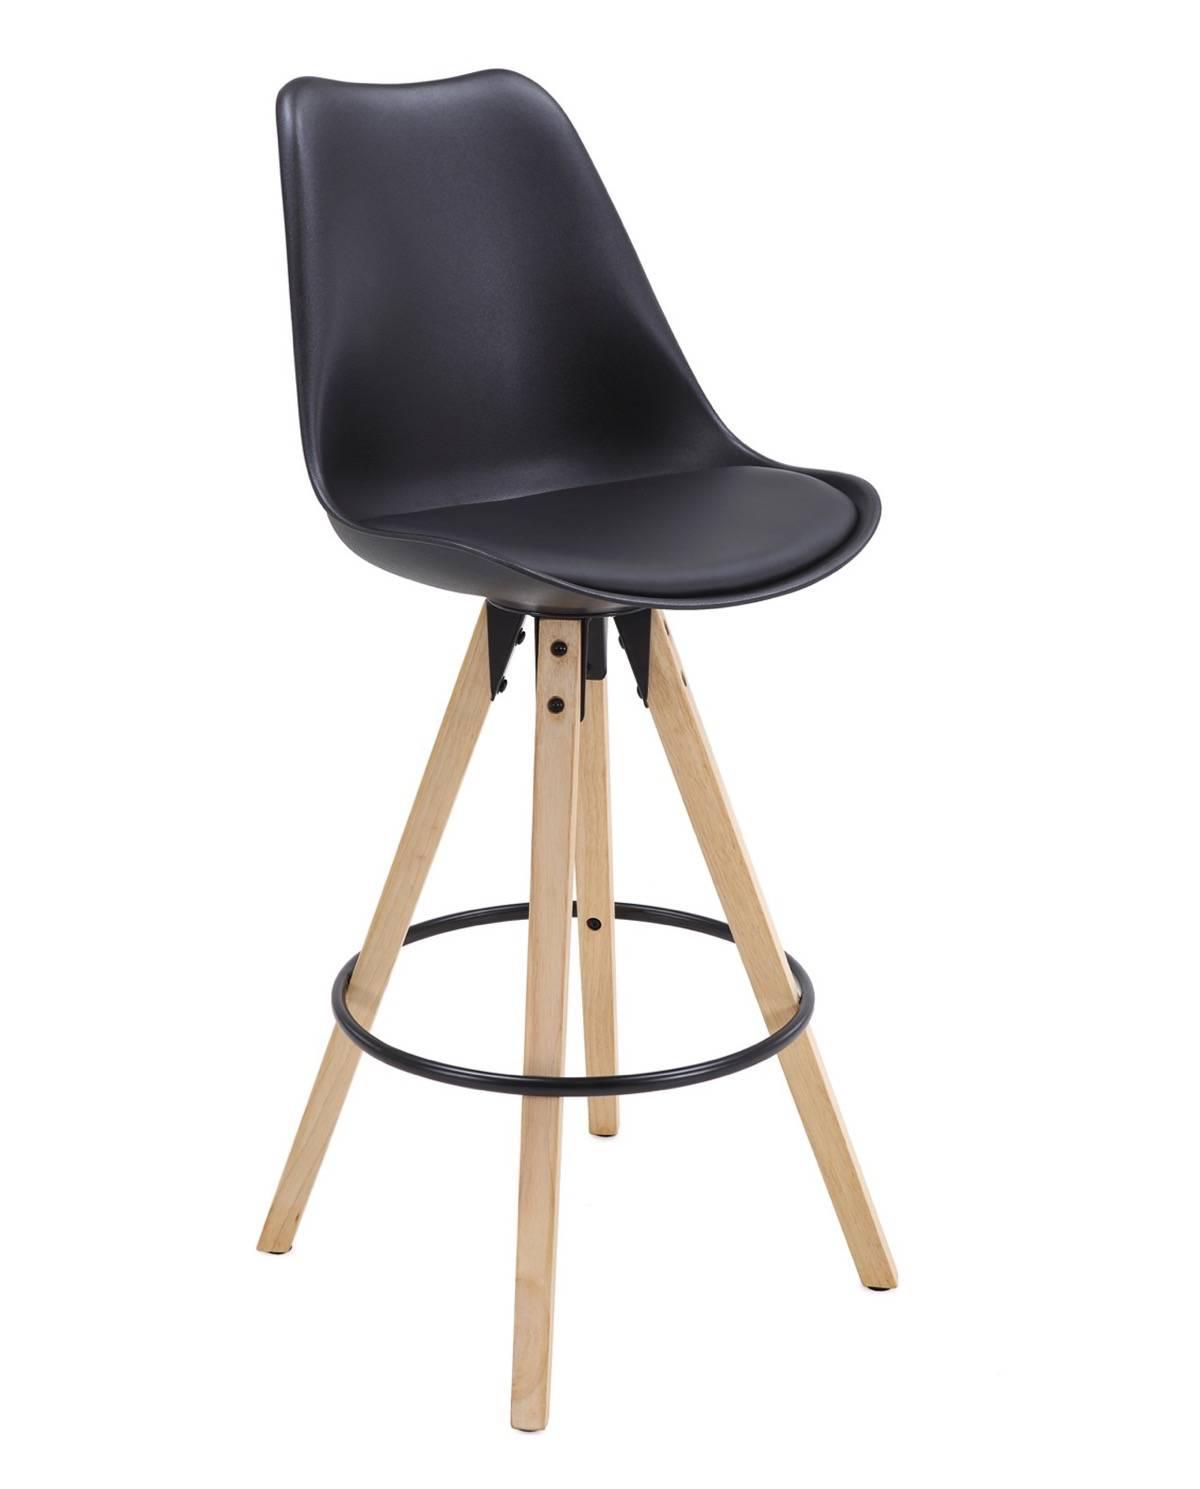 tabouret de bar dsw lot de 2 noir blanc ou gris sleo. Black Bedroom Furniture Sets. Home Design Ideas